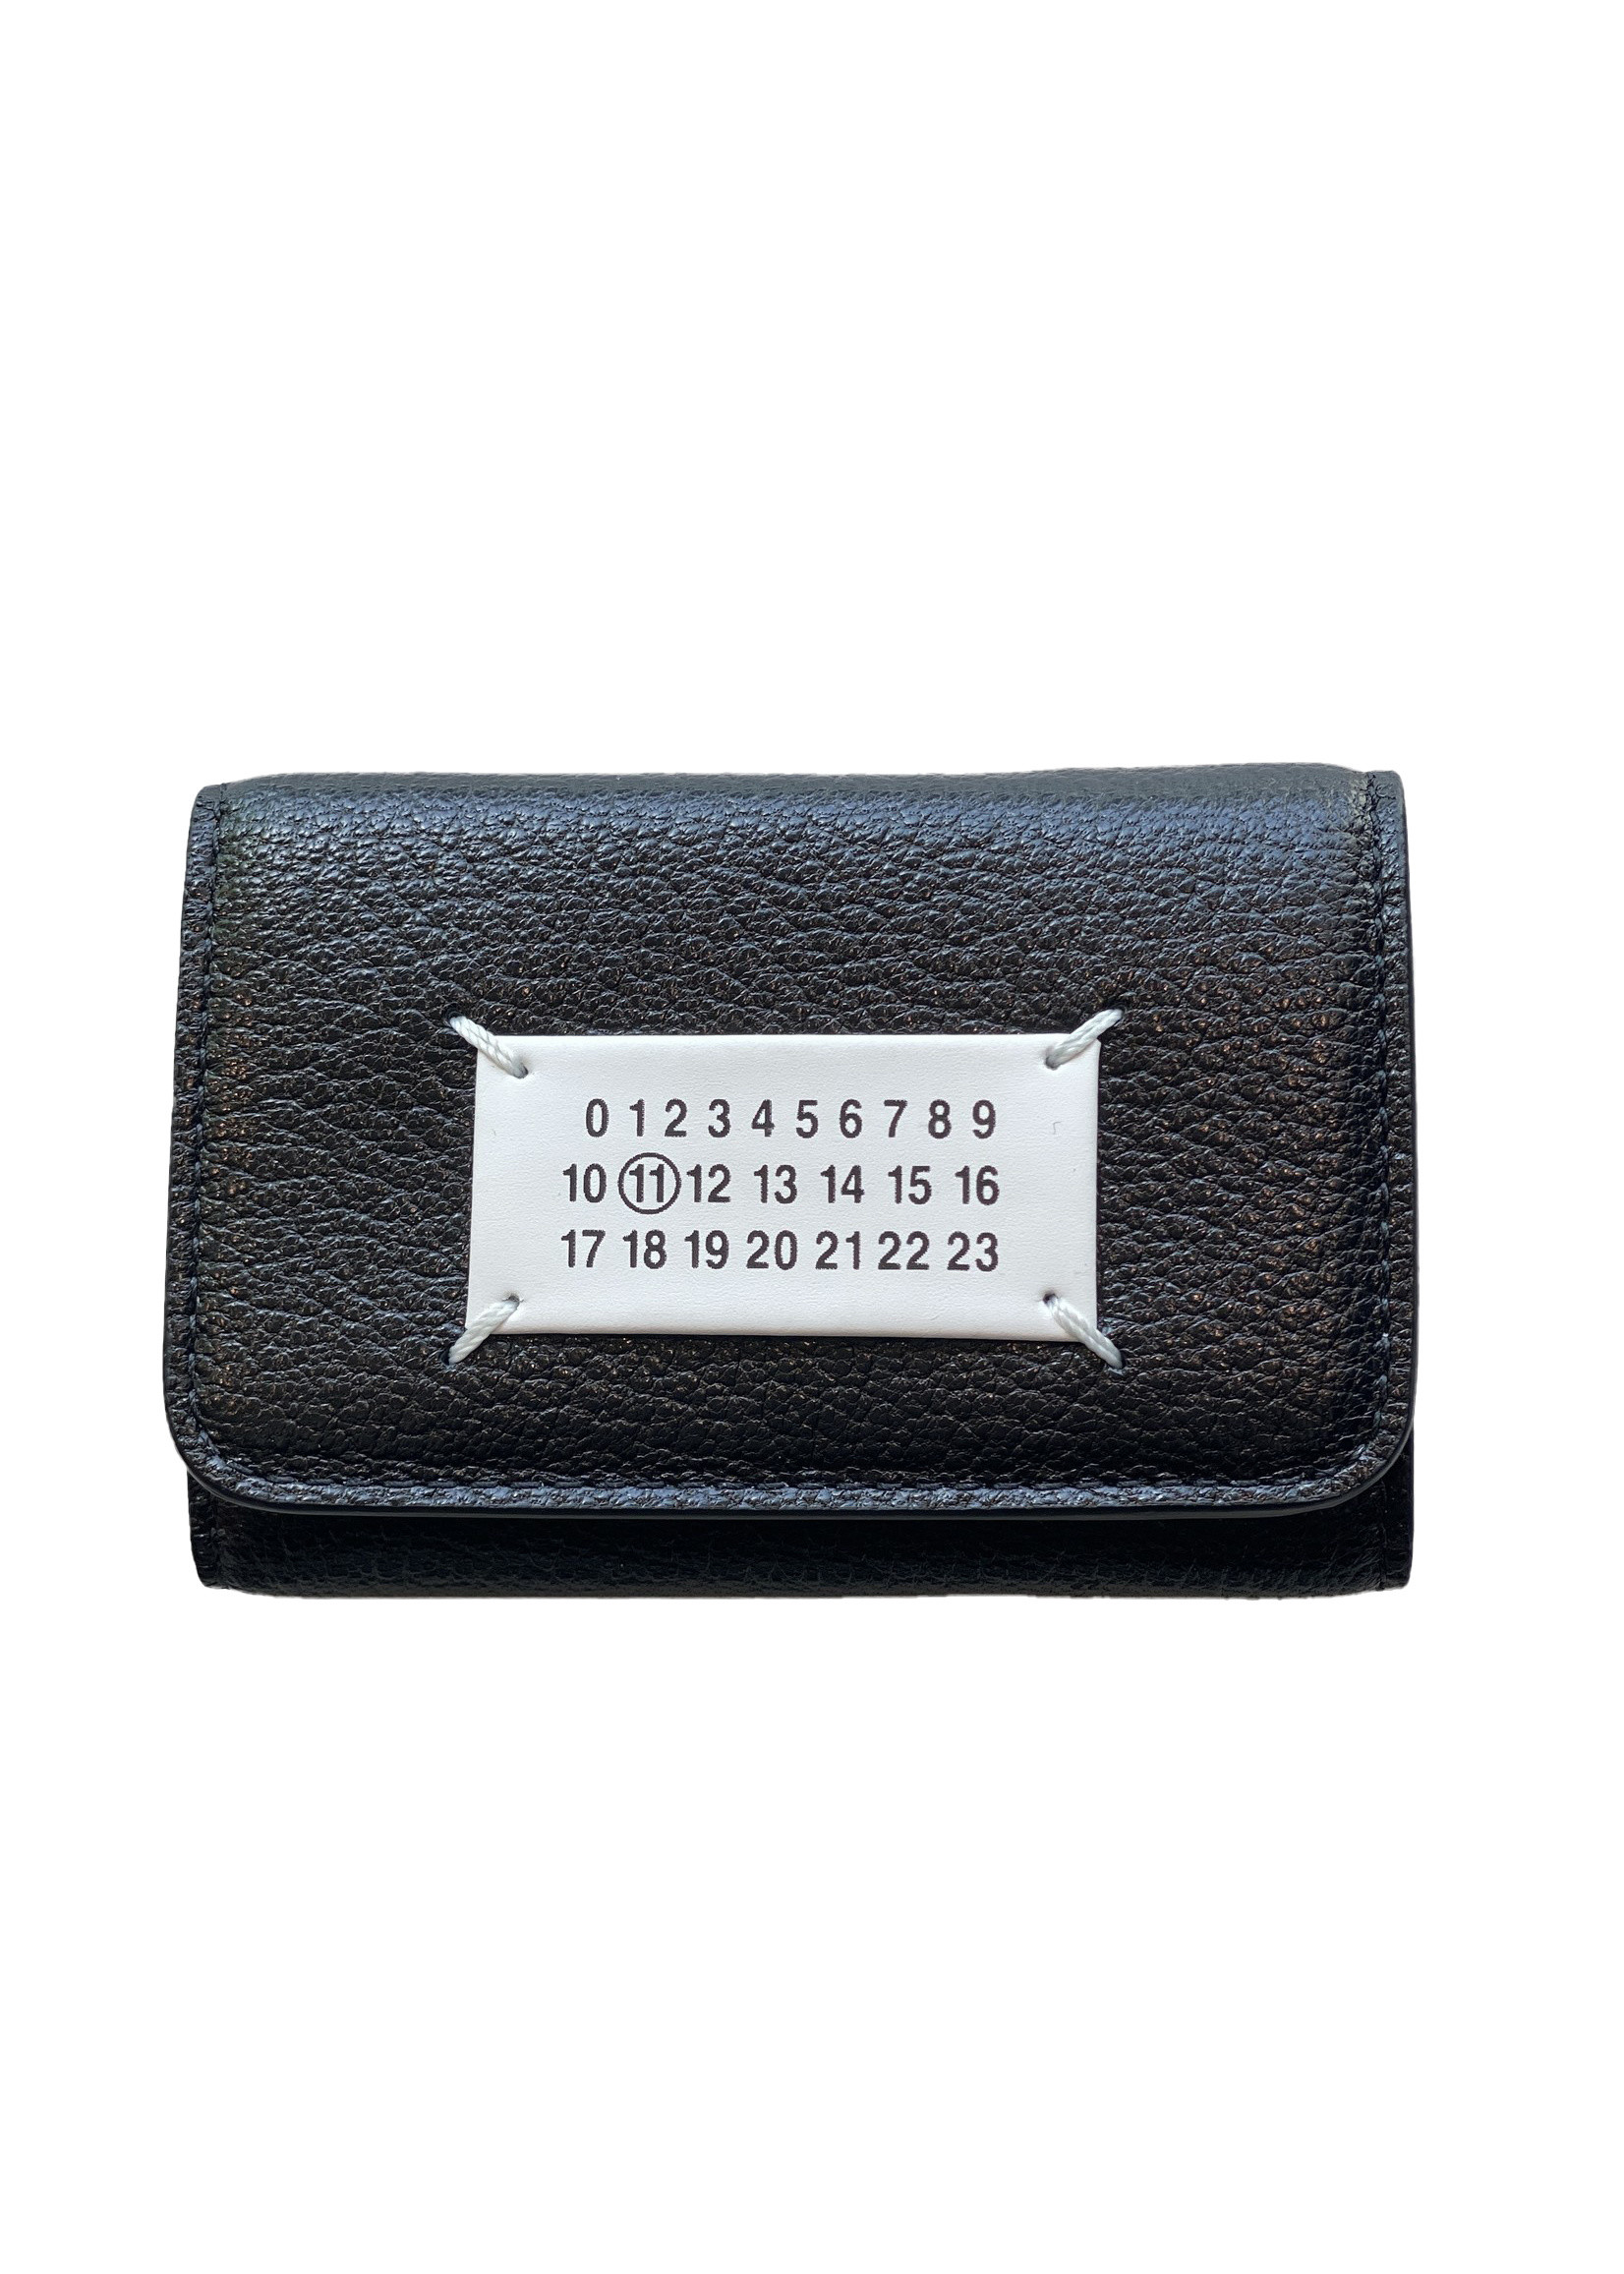 Maison Margiela Small Snap Wallet in Black